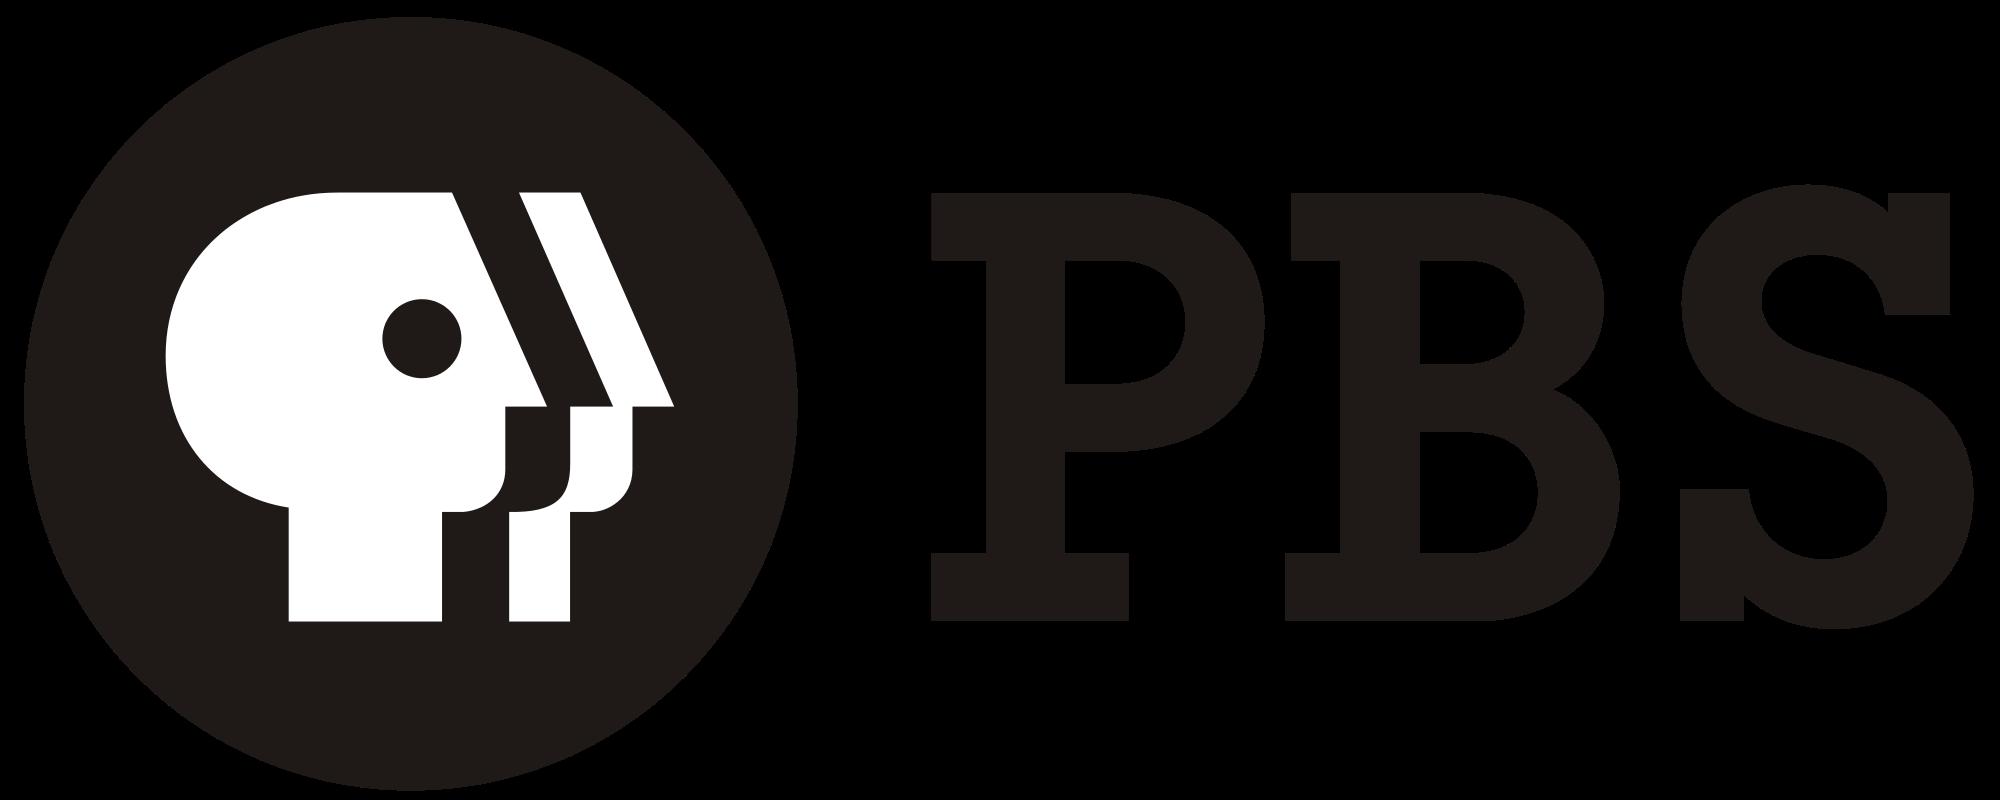 *PBS_logo.png